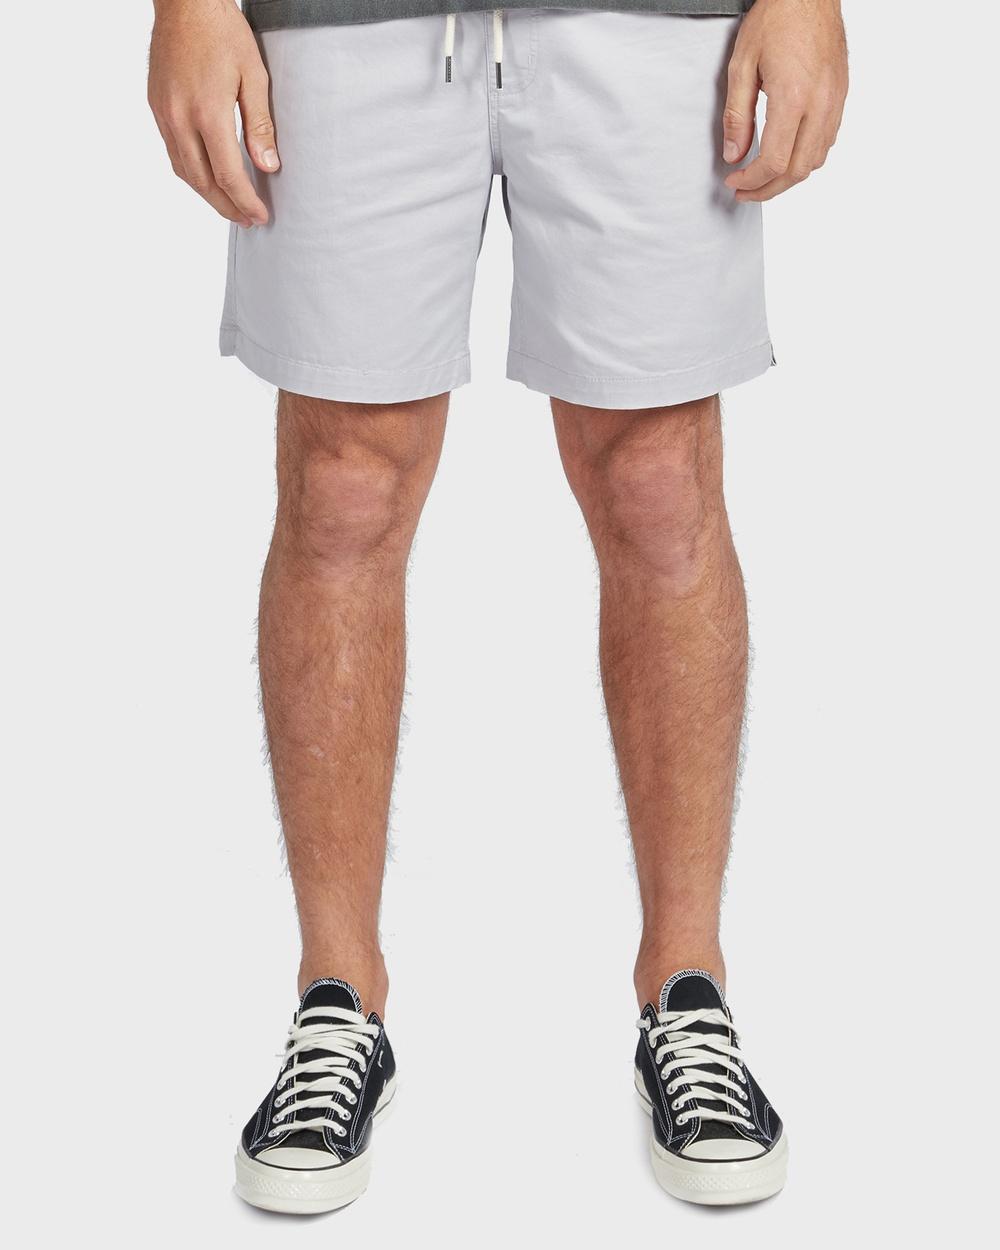 Academy Brand Volley Short Shorts Grey